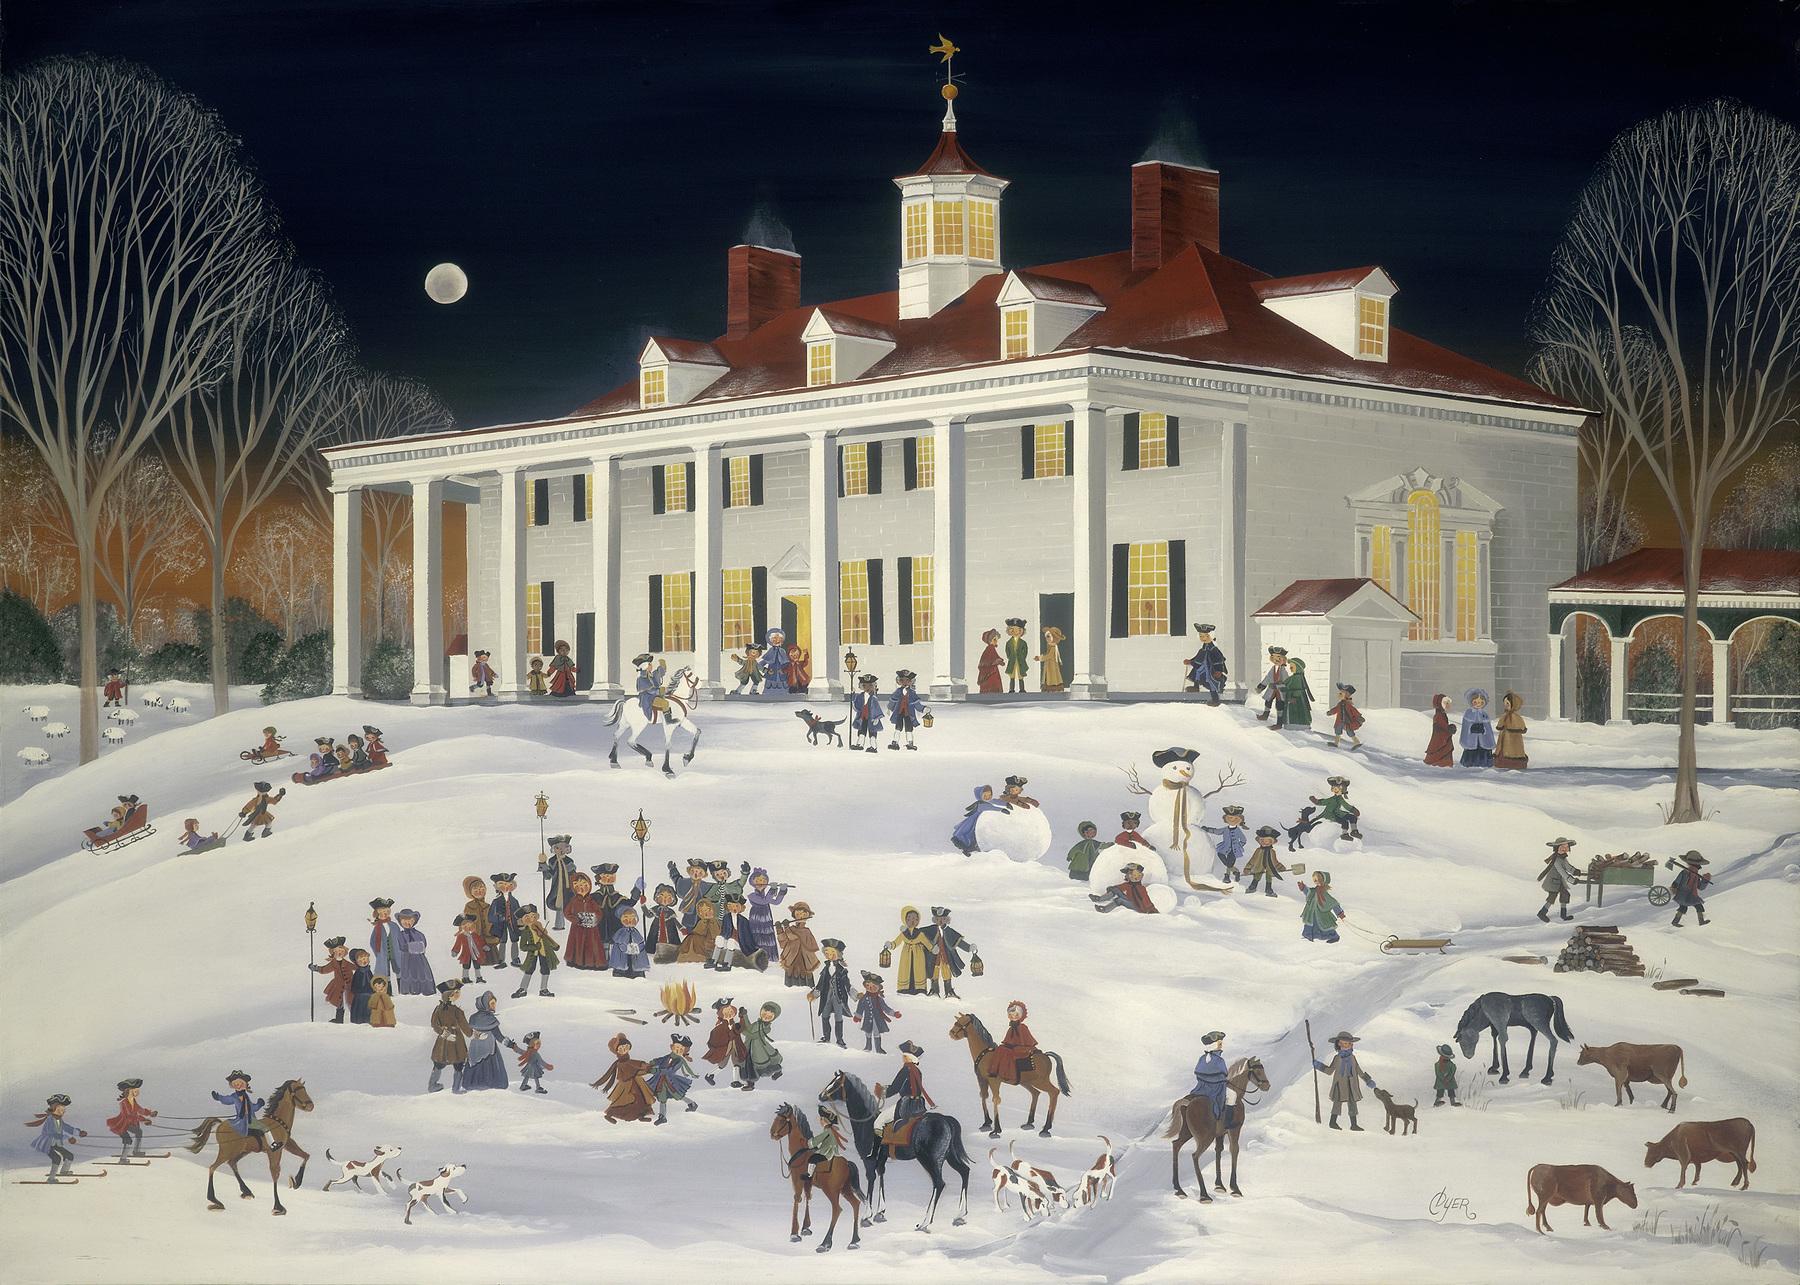 A Joyful Group at Mount Vernon